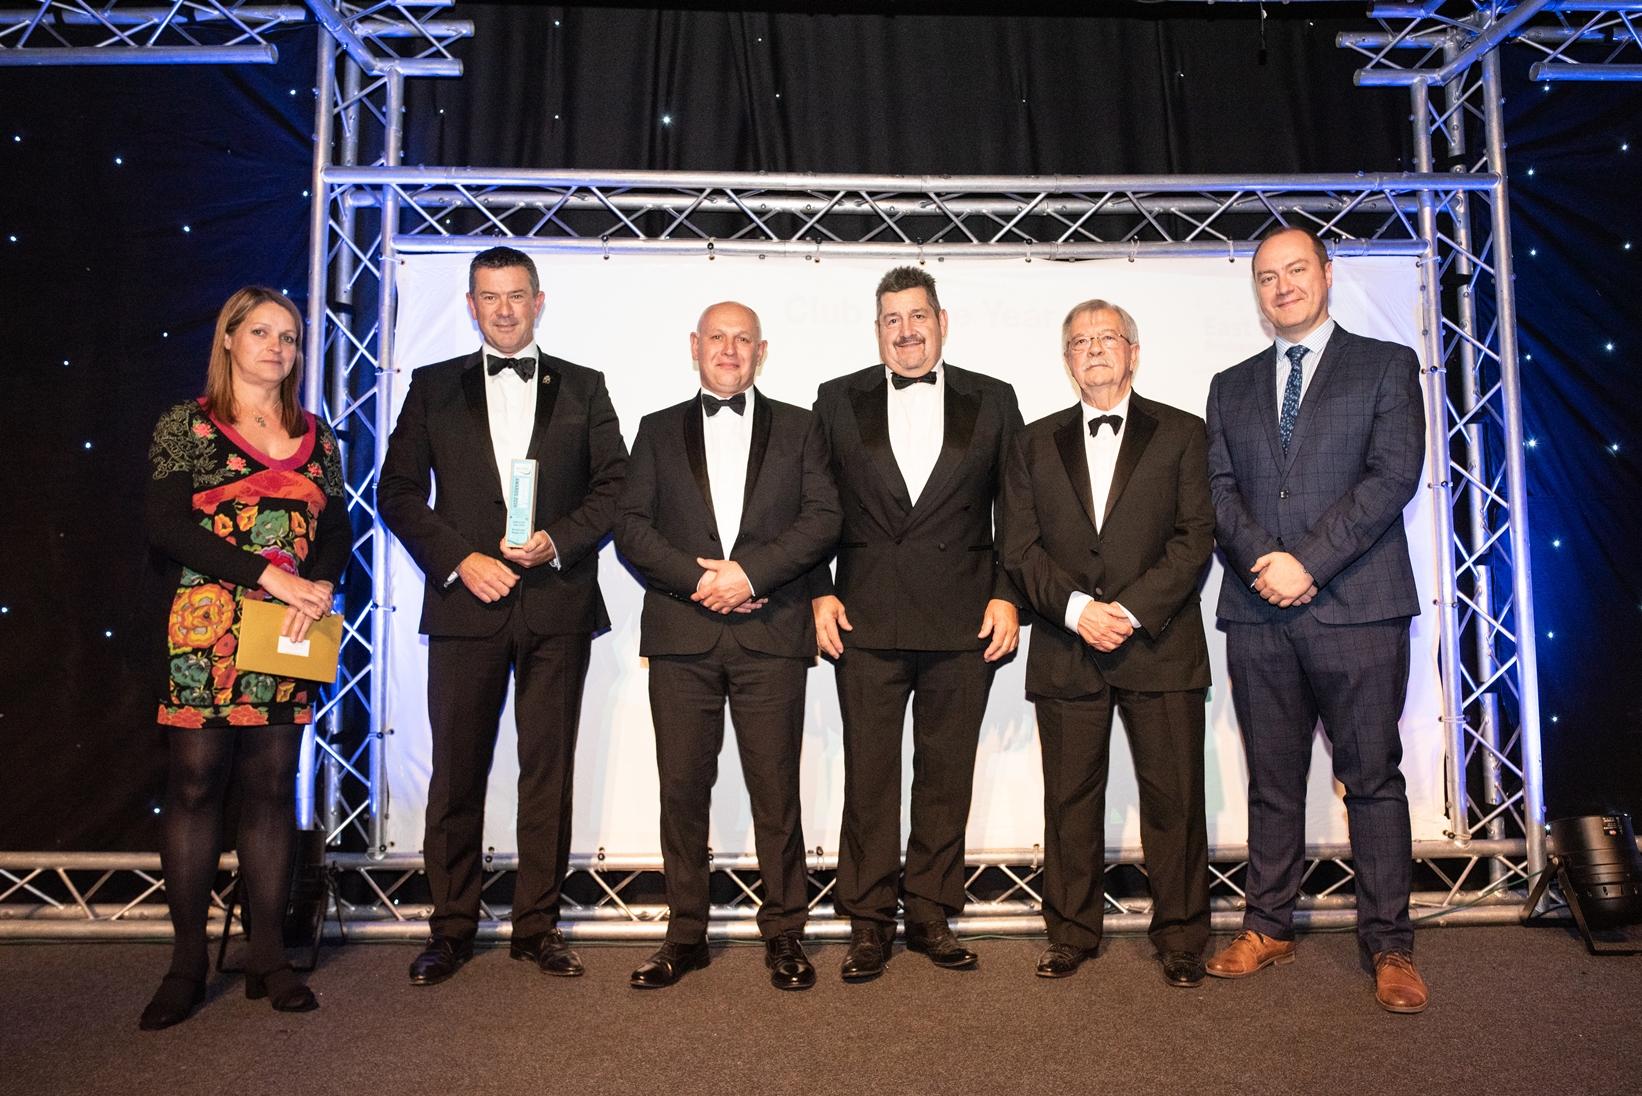 ESBCA Awards Winners - Club of the Year - Woodbridge Rugby Club 2019 16.jpg